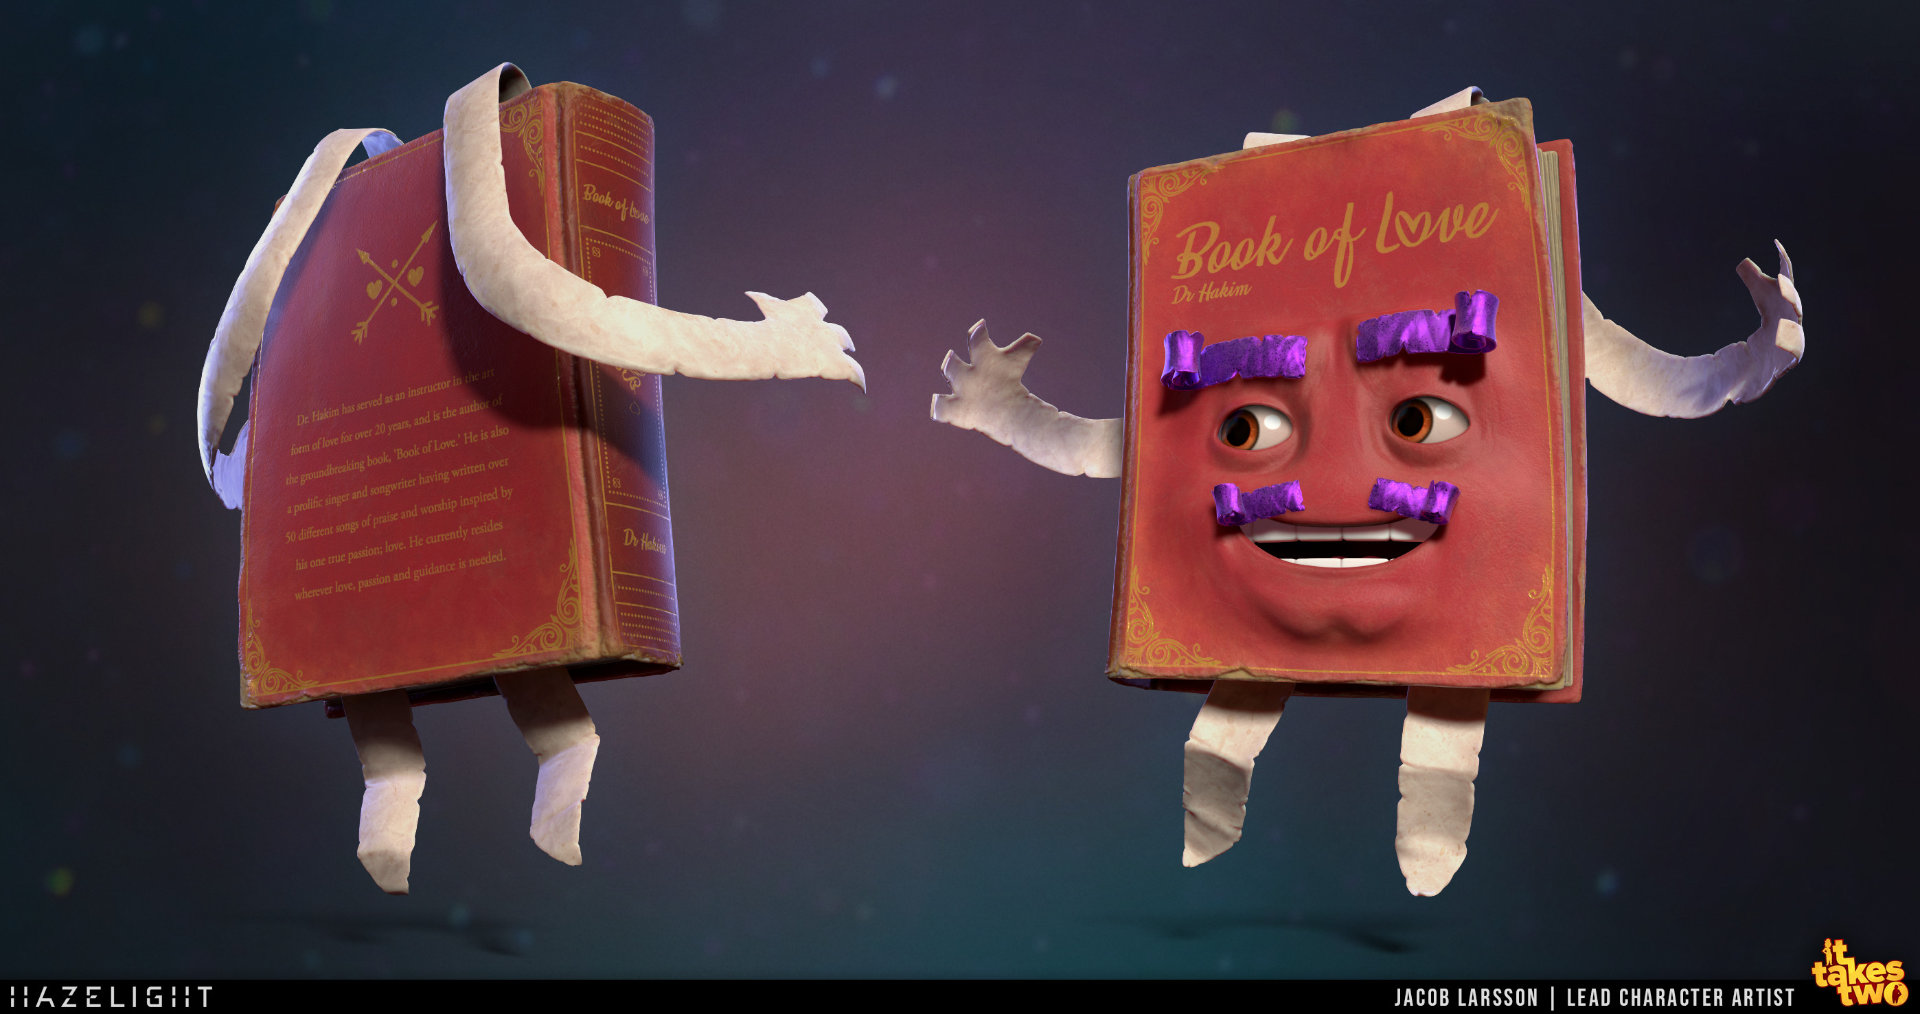 Quelle: Artstation - Jacob Larsson - Book of Love